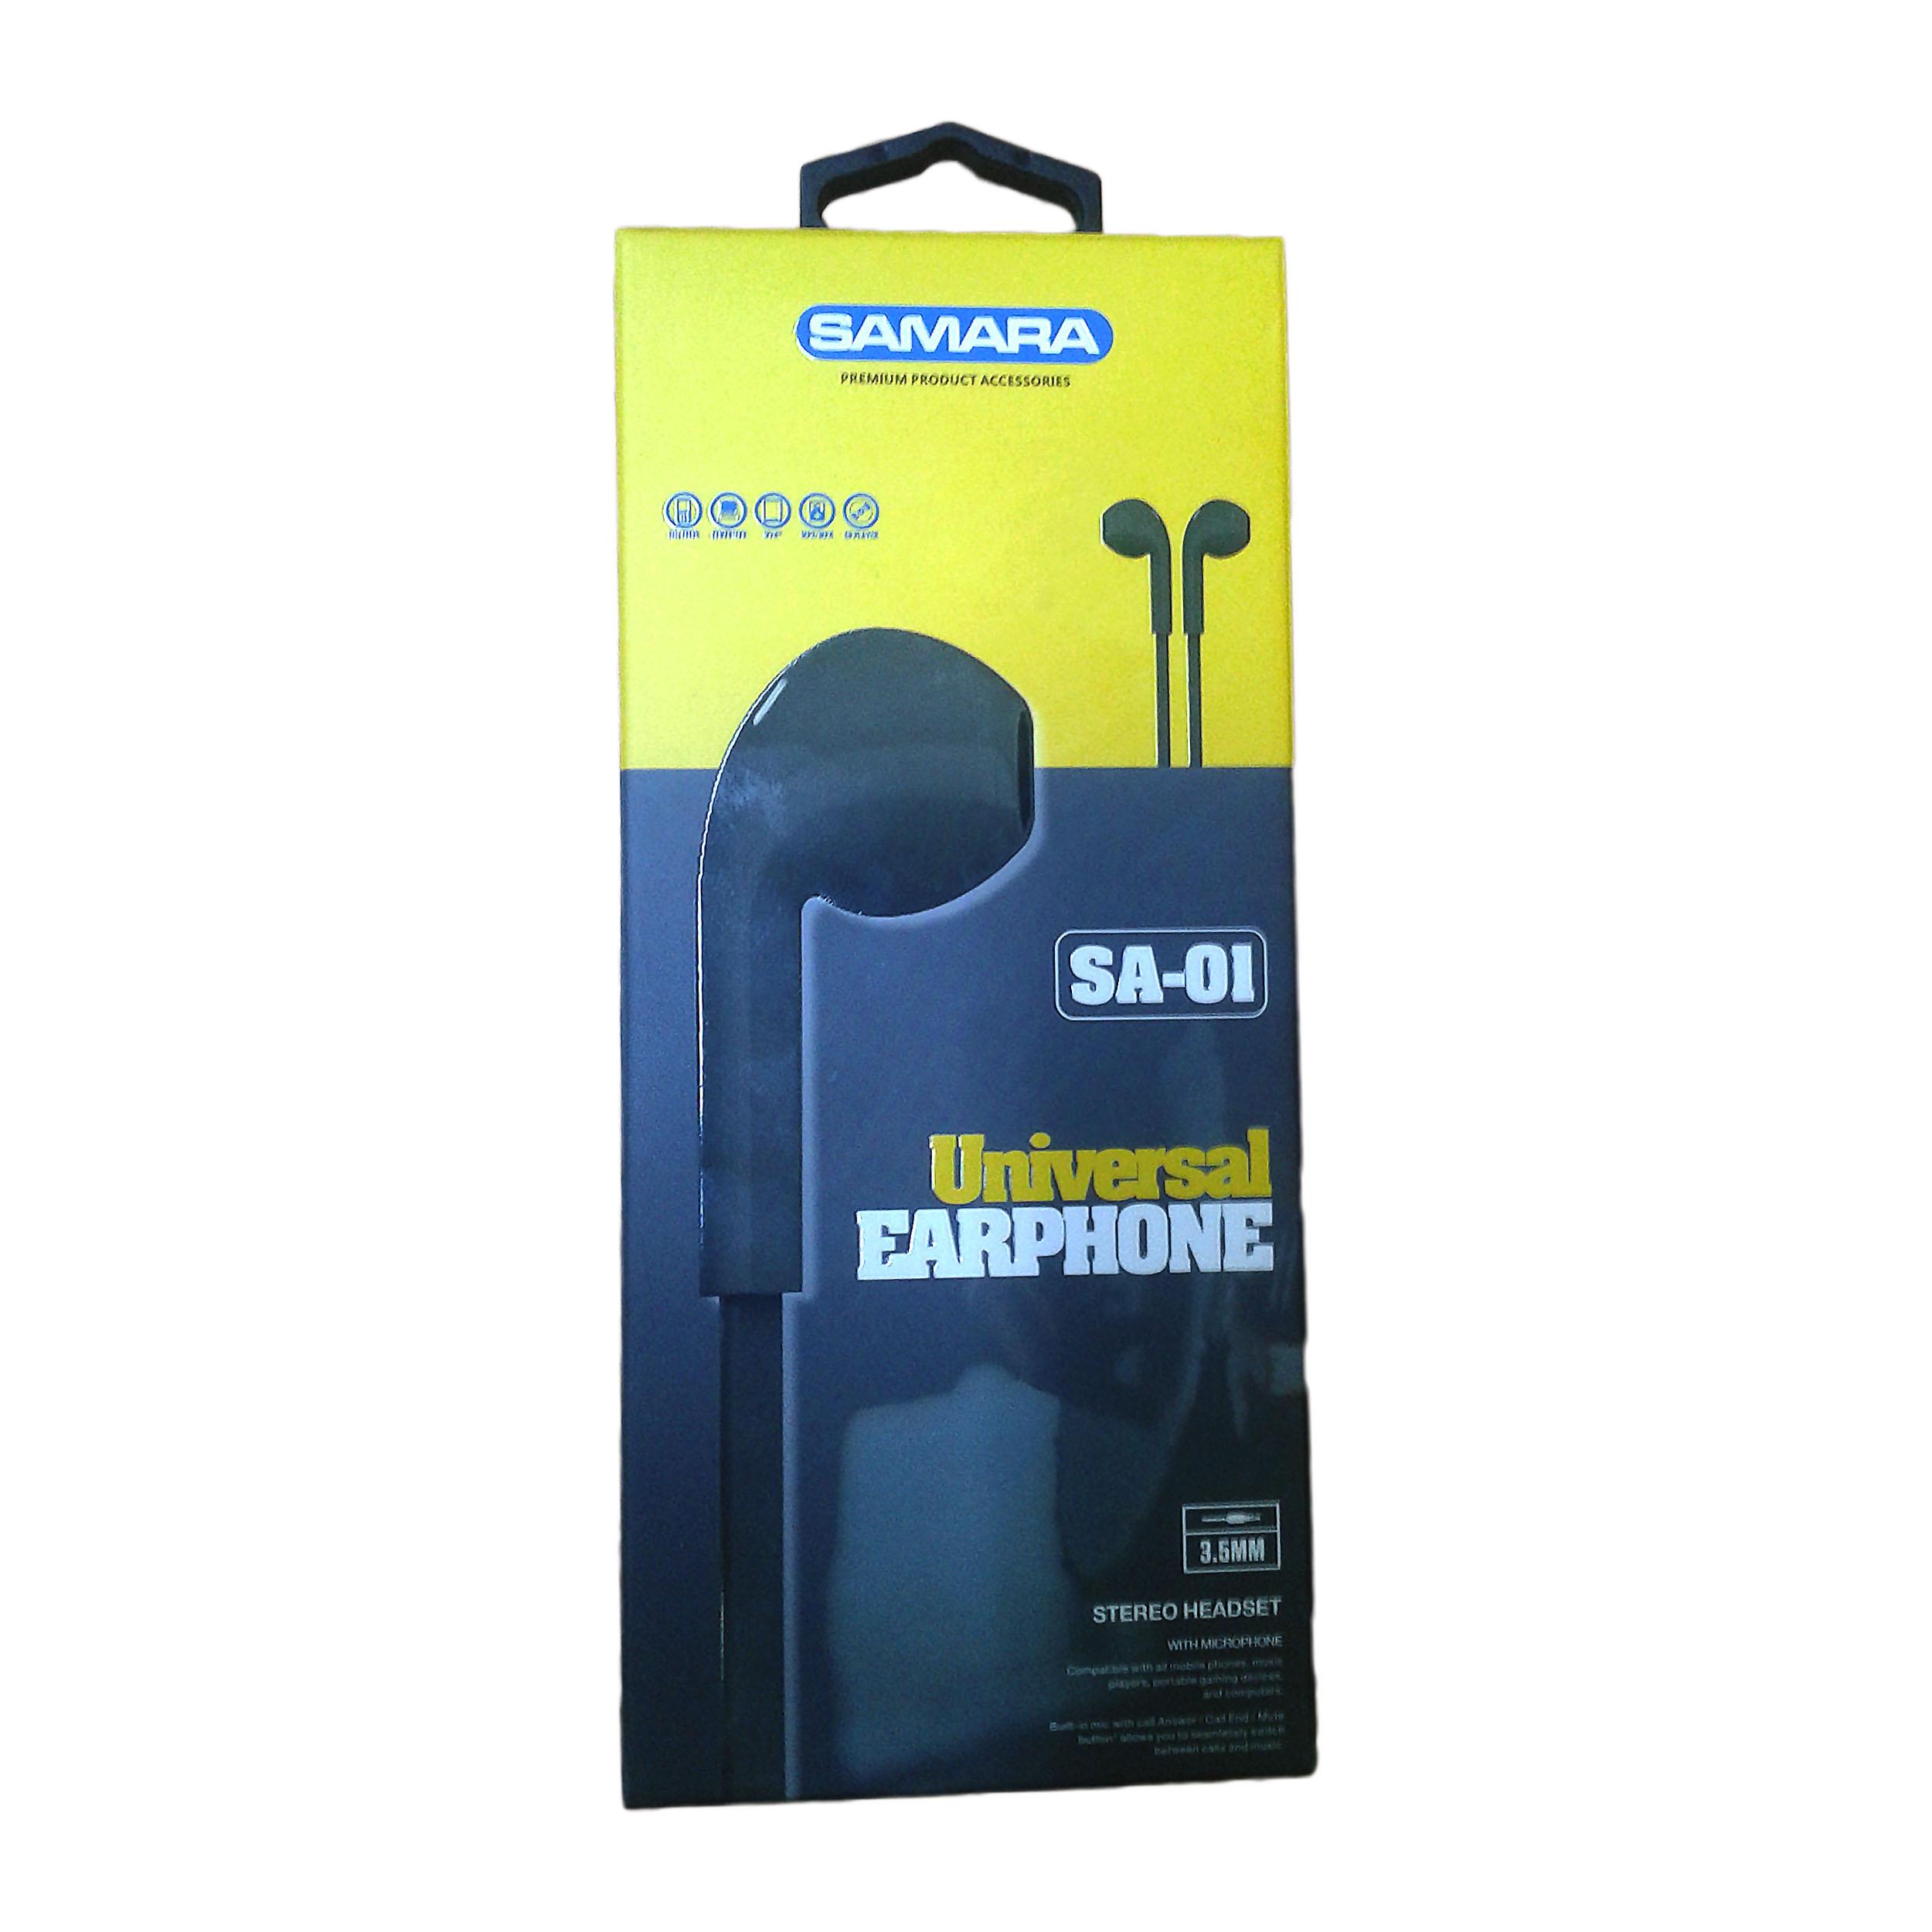 EARPHONE SAMARA HIGH QUALITY FOR SMARTPHONE OR TAB + VOLUME CONTROL  SA-01 ,Smartphones & Tab Headsets